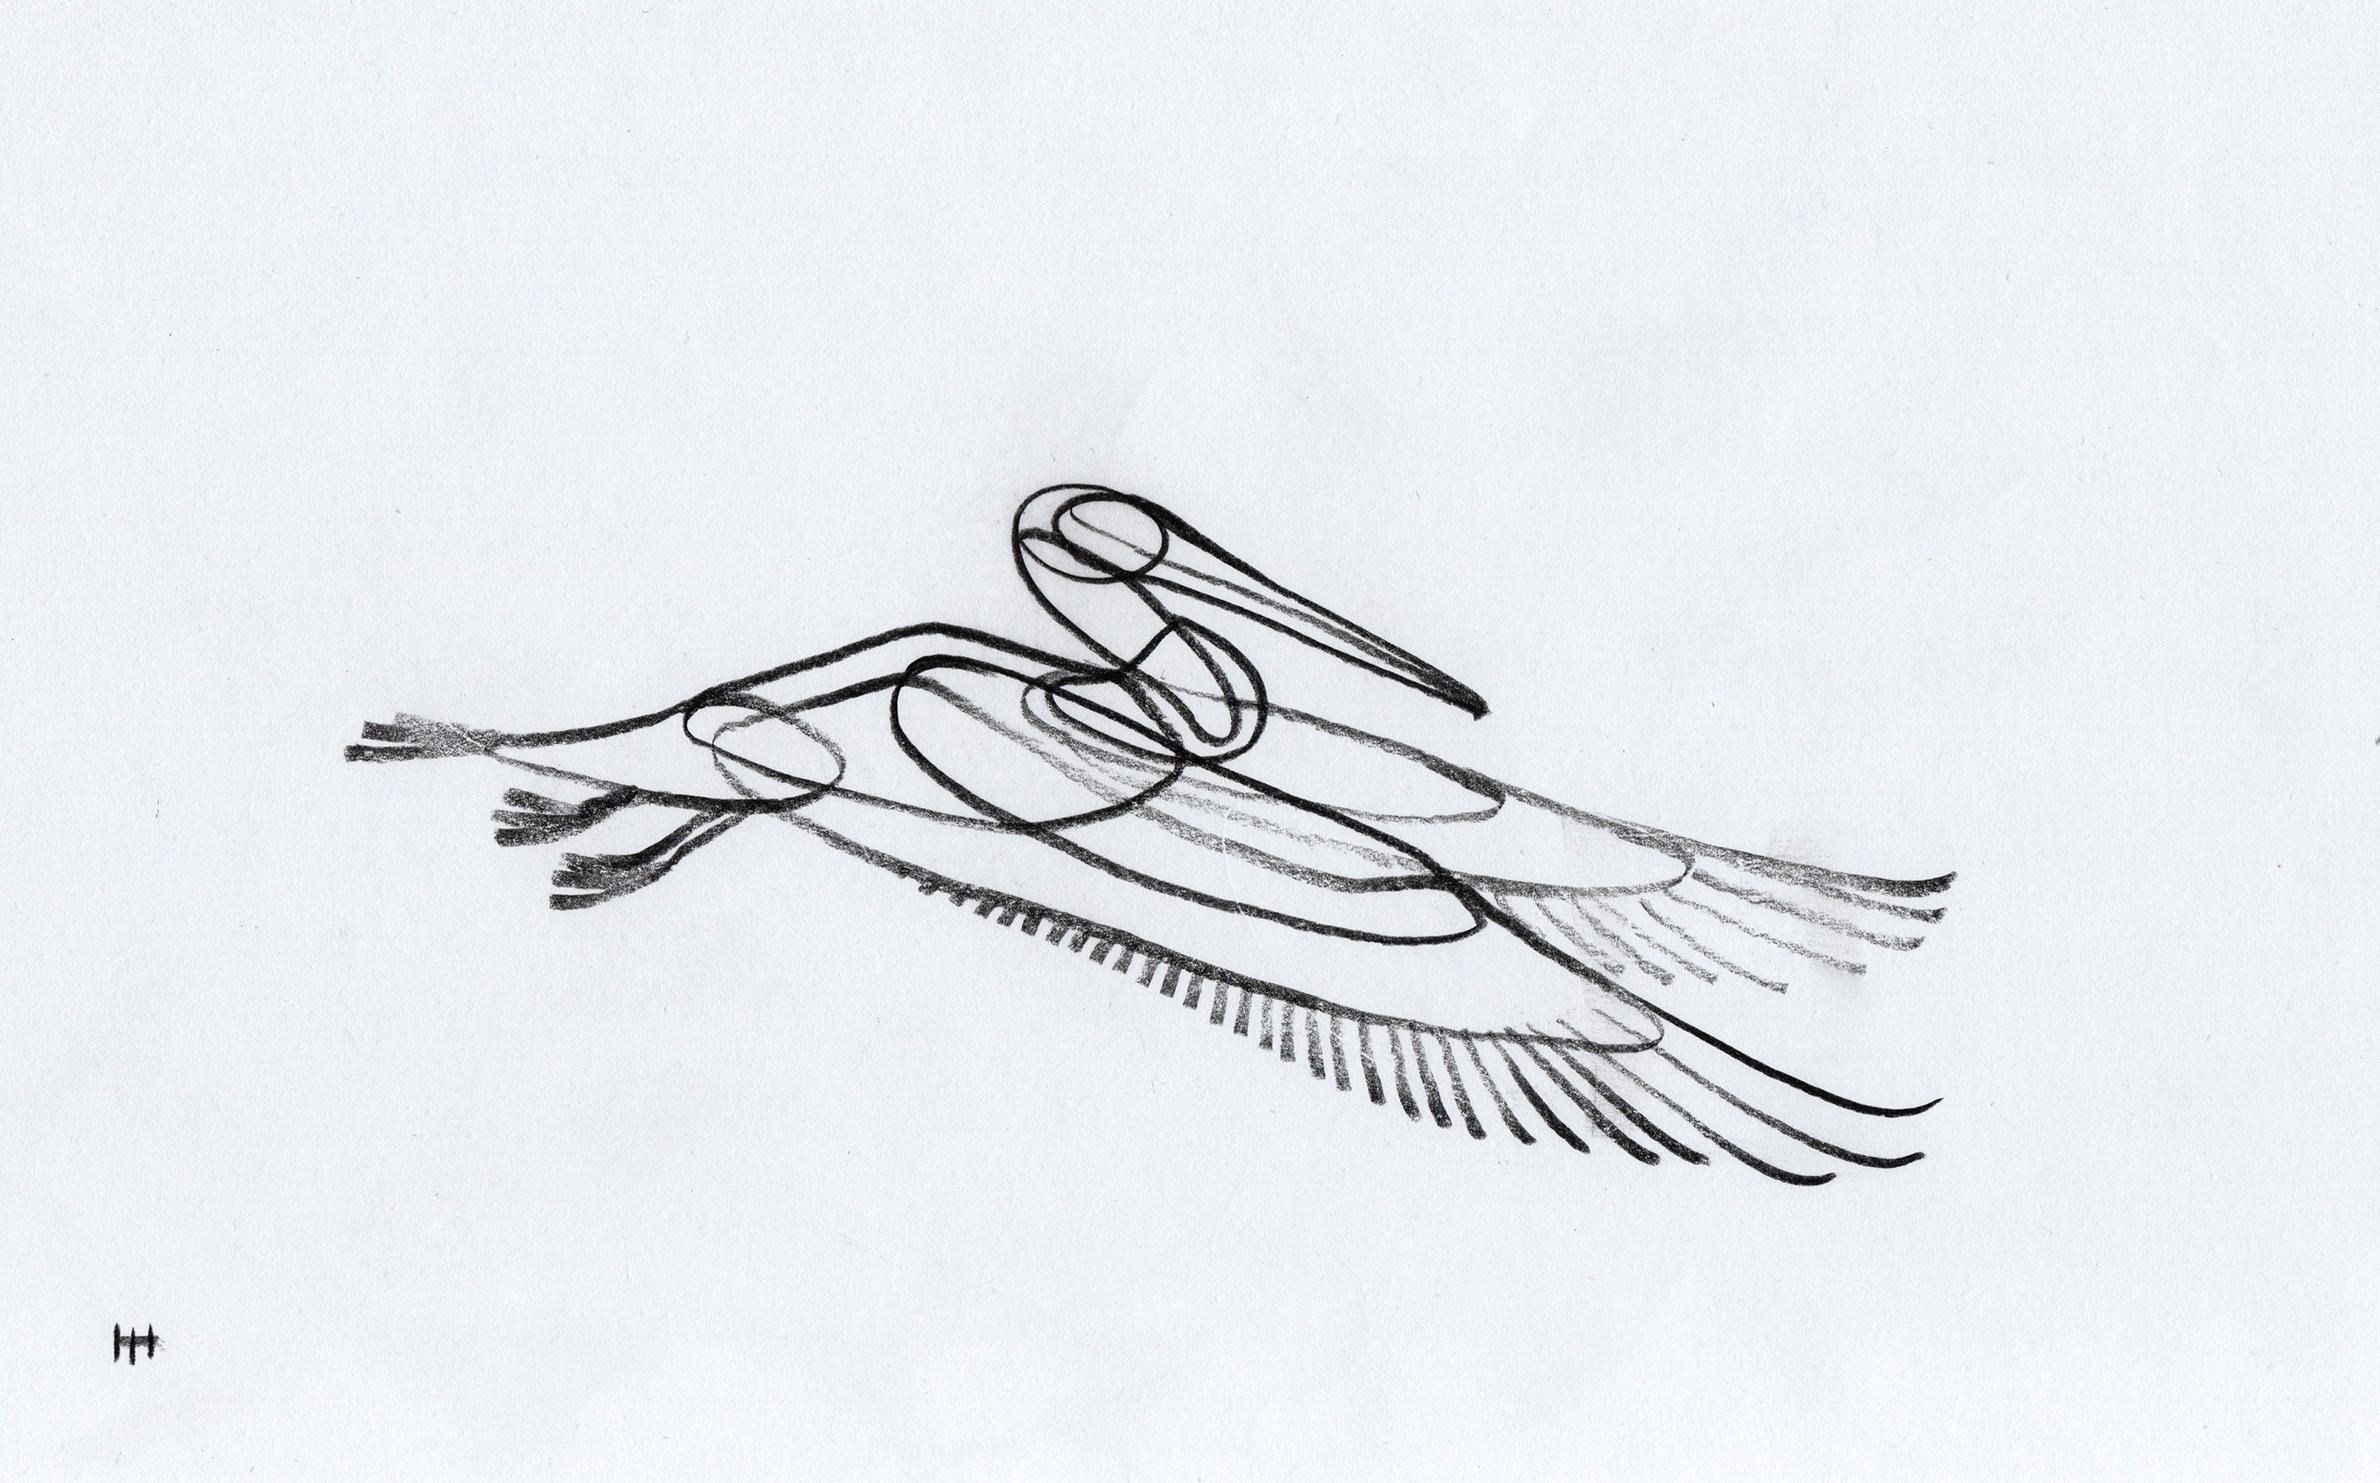 PticyLinejnye_0 33.jpg